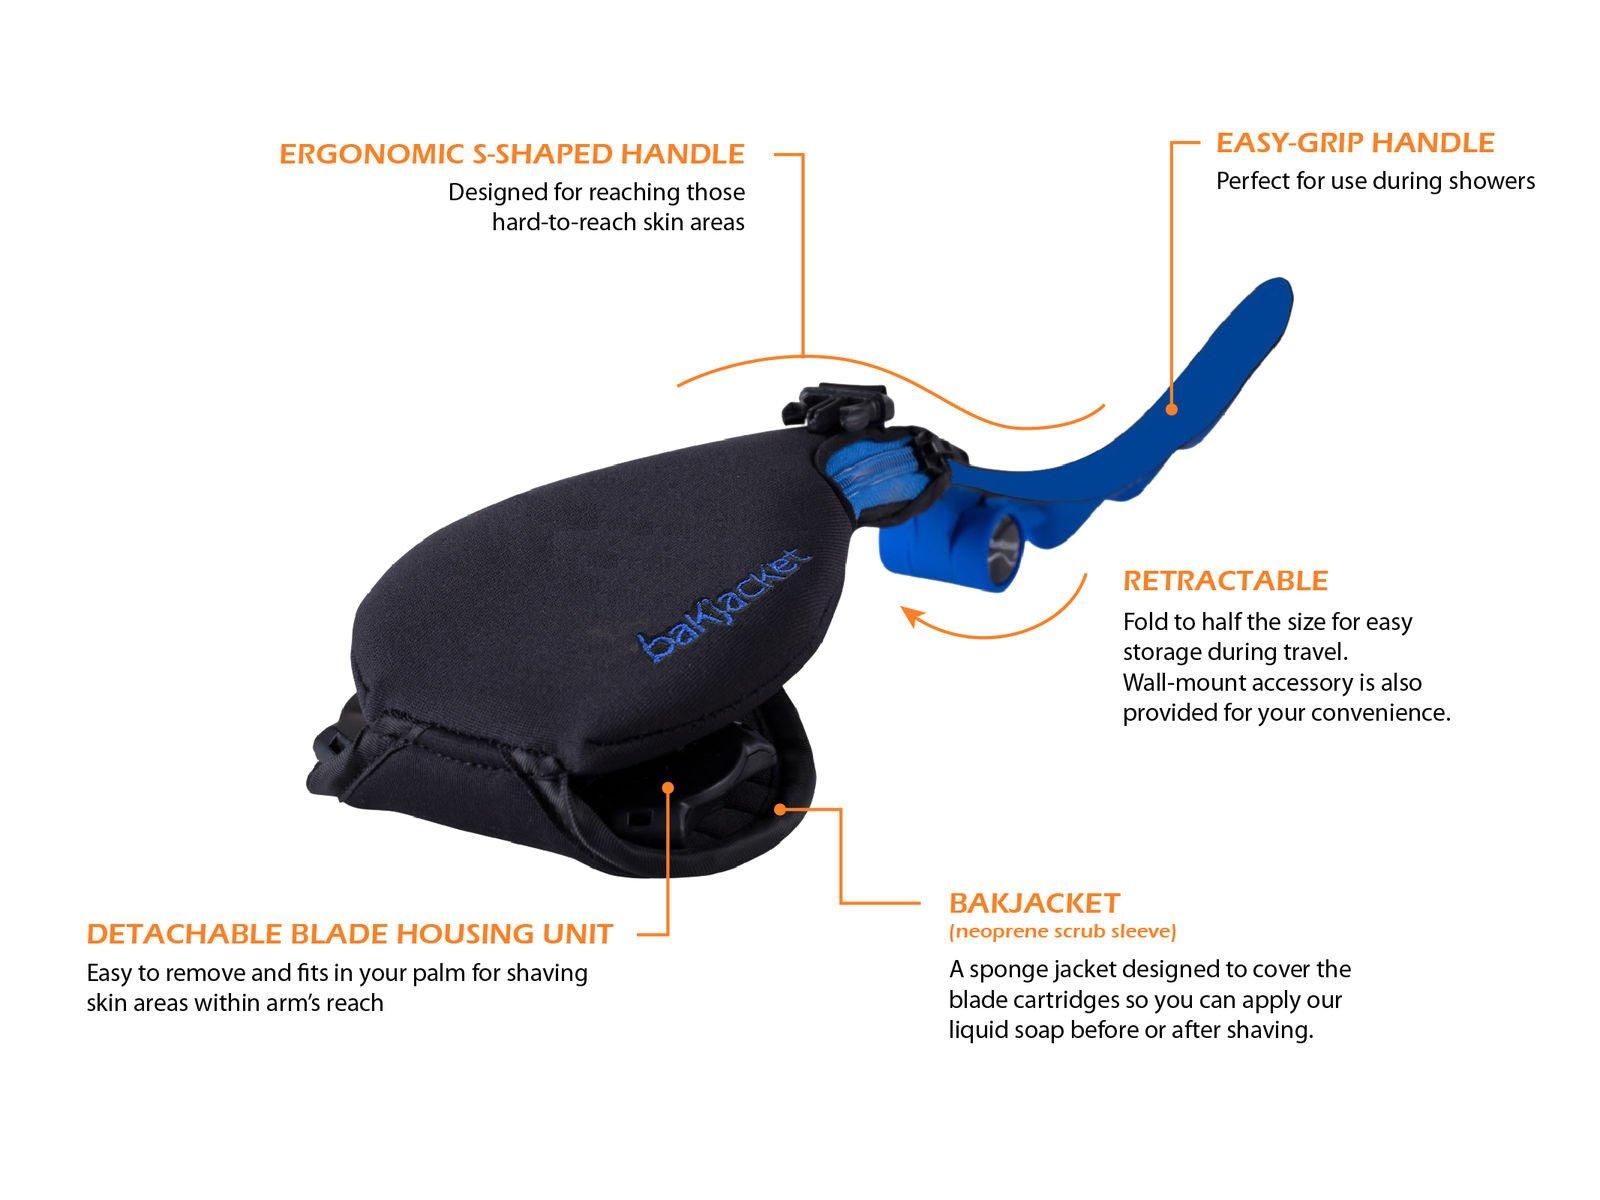 SD Version 2.0 Ultimate Men's Back Hair Body 3 in 1 Shaver – Ergonomic & Lightweight Personal Body Grooming Kit